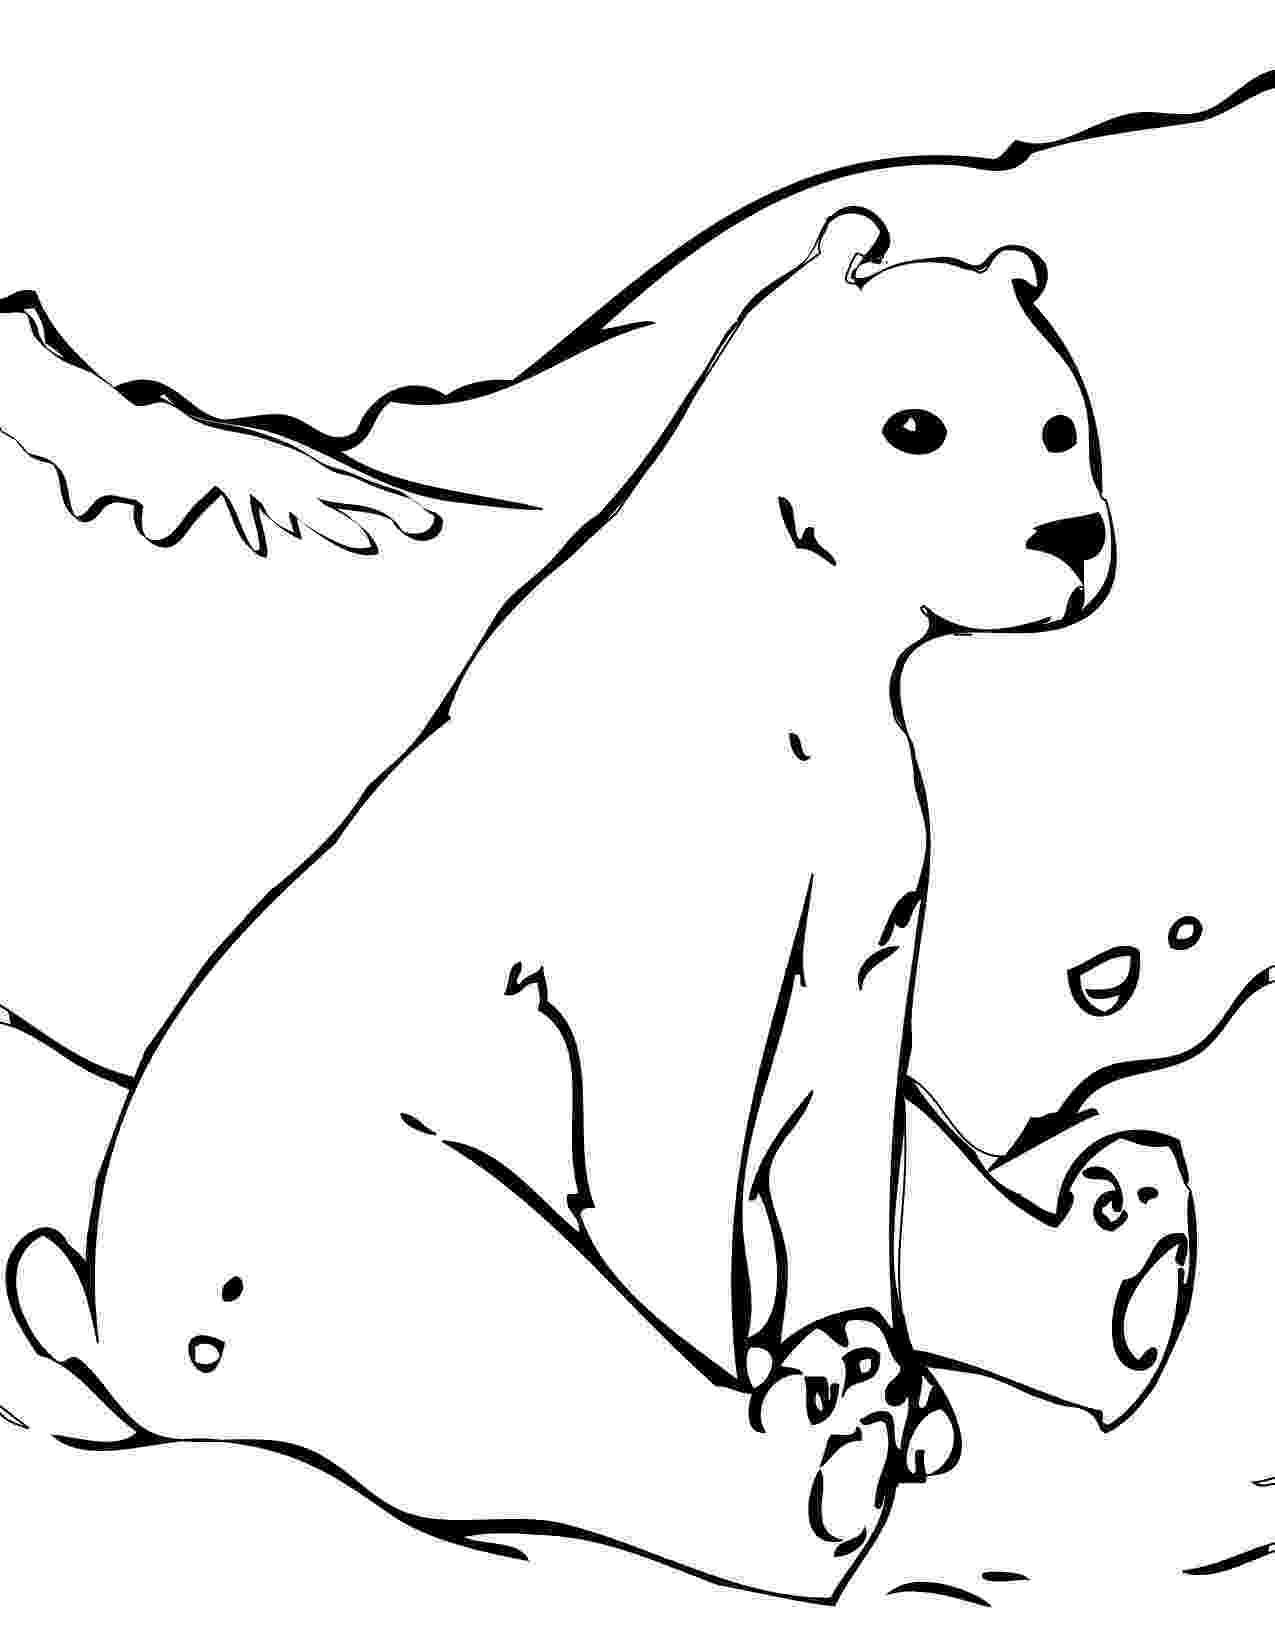 polar bear printables free printable polar bear coloring pages for kids polar bear printables